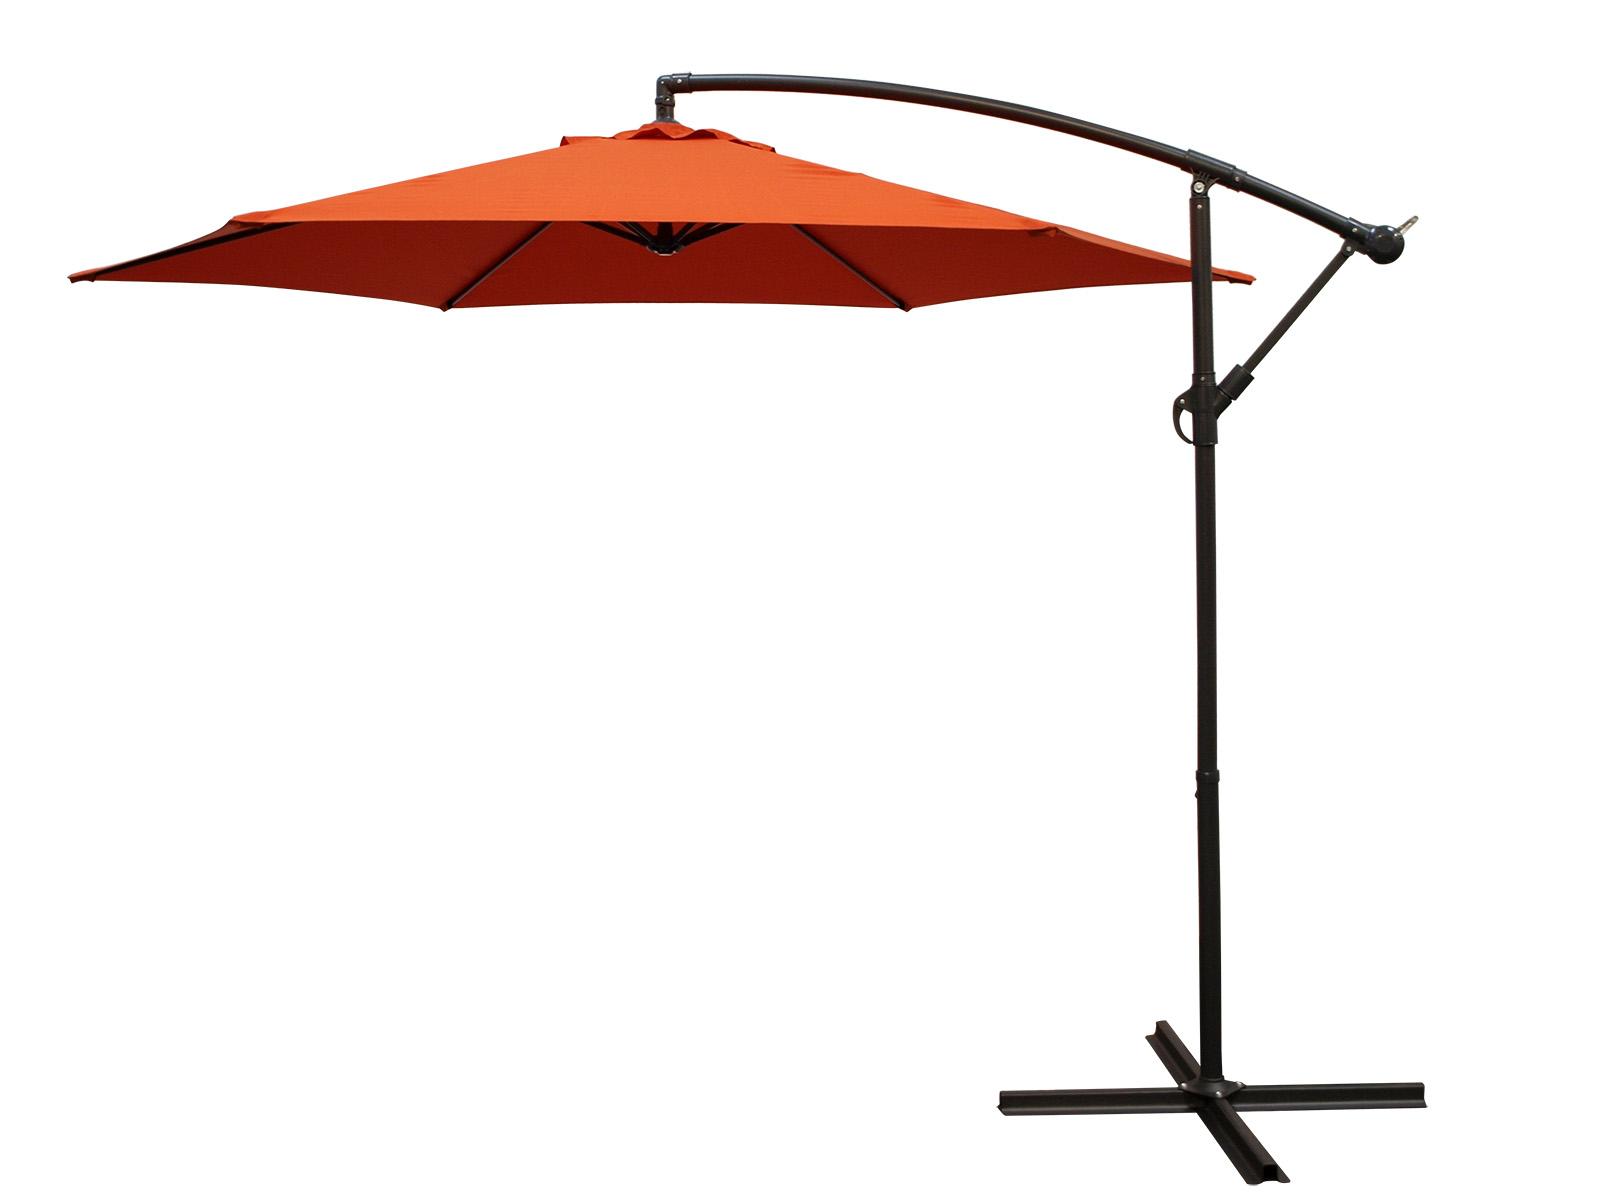 ampelschirm h ngeschirm mit kurbel 300cm terra gestell alu uv schutzfaktor 50 ebay. Black Bedroom Furniture Sets. Home Design Ideas